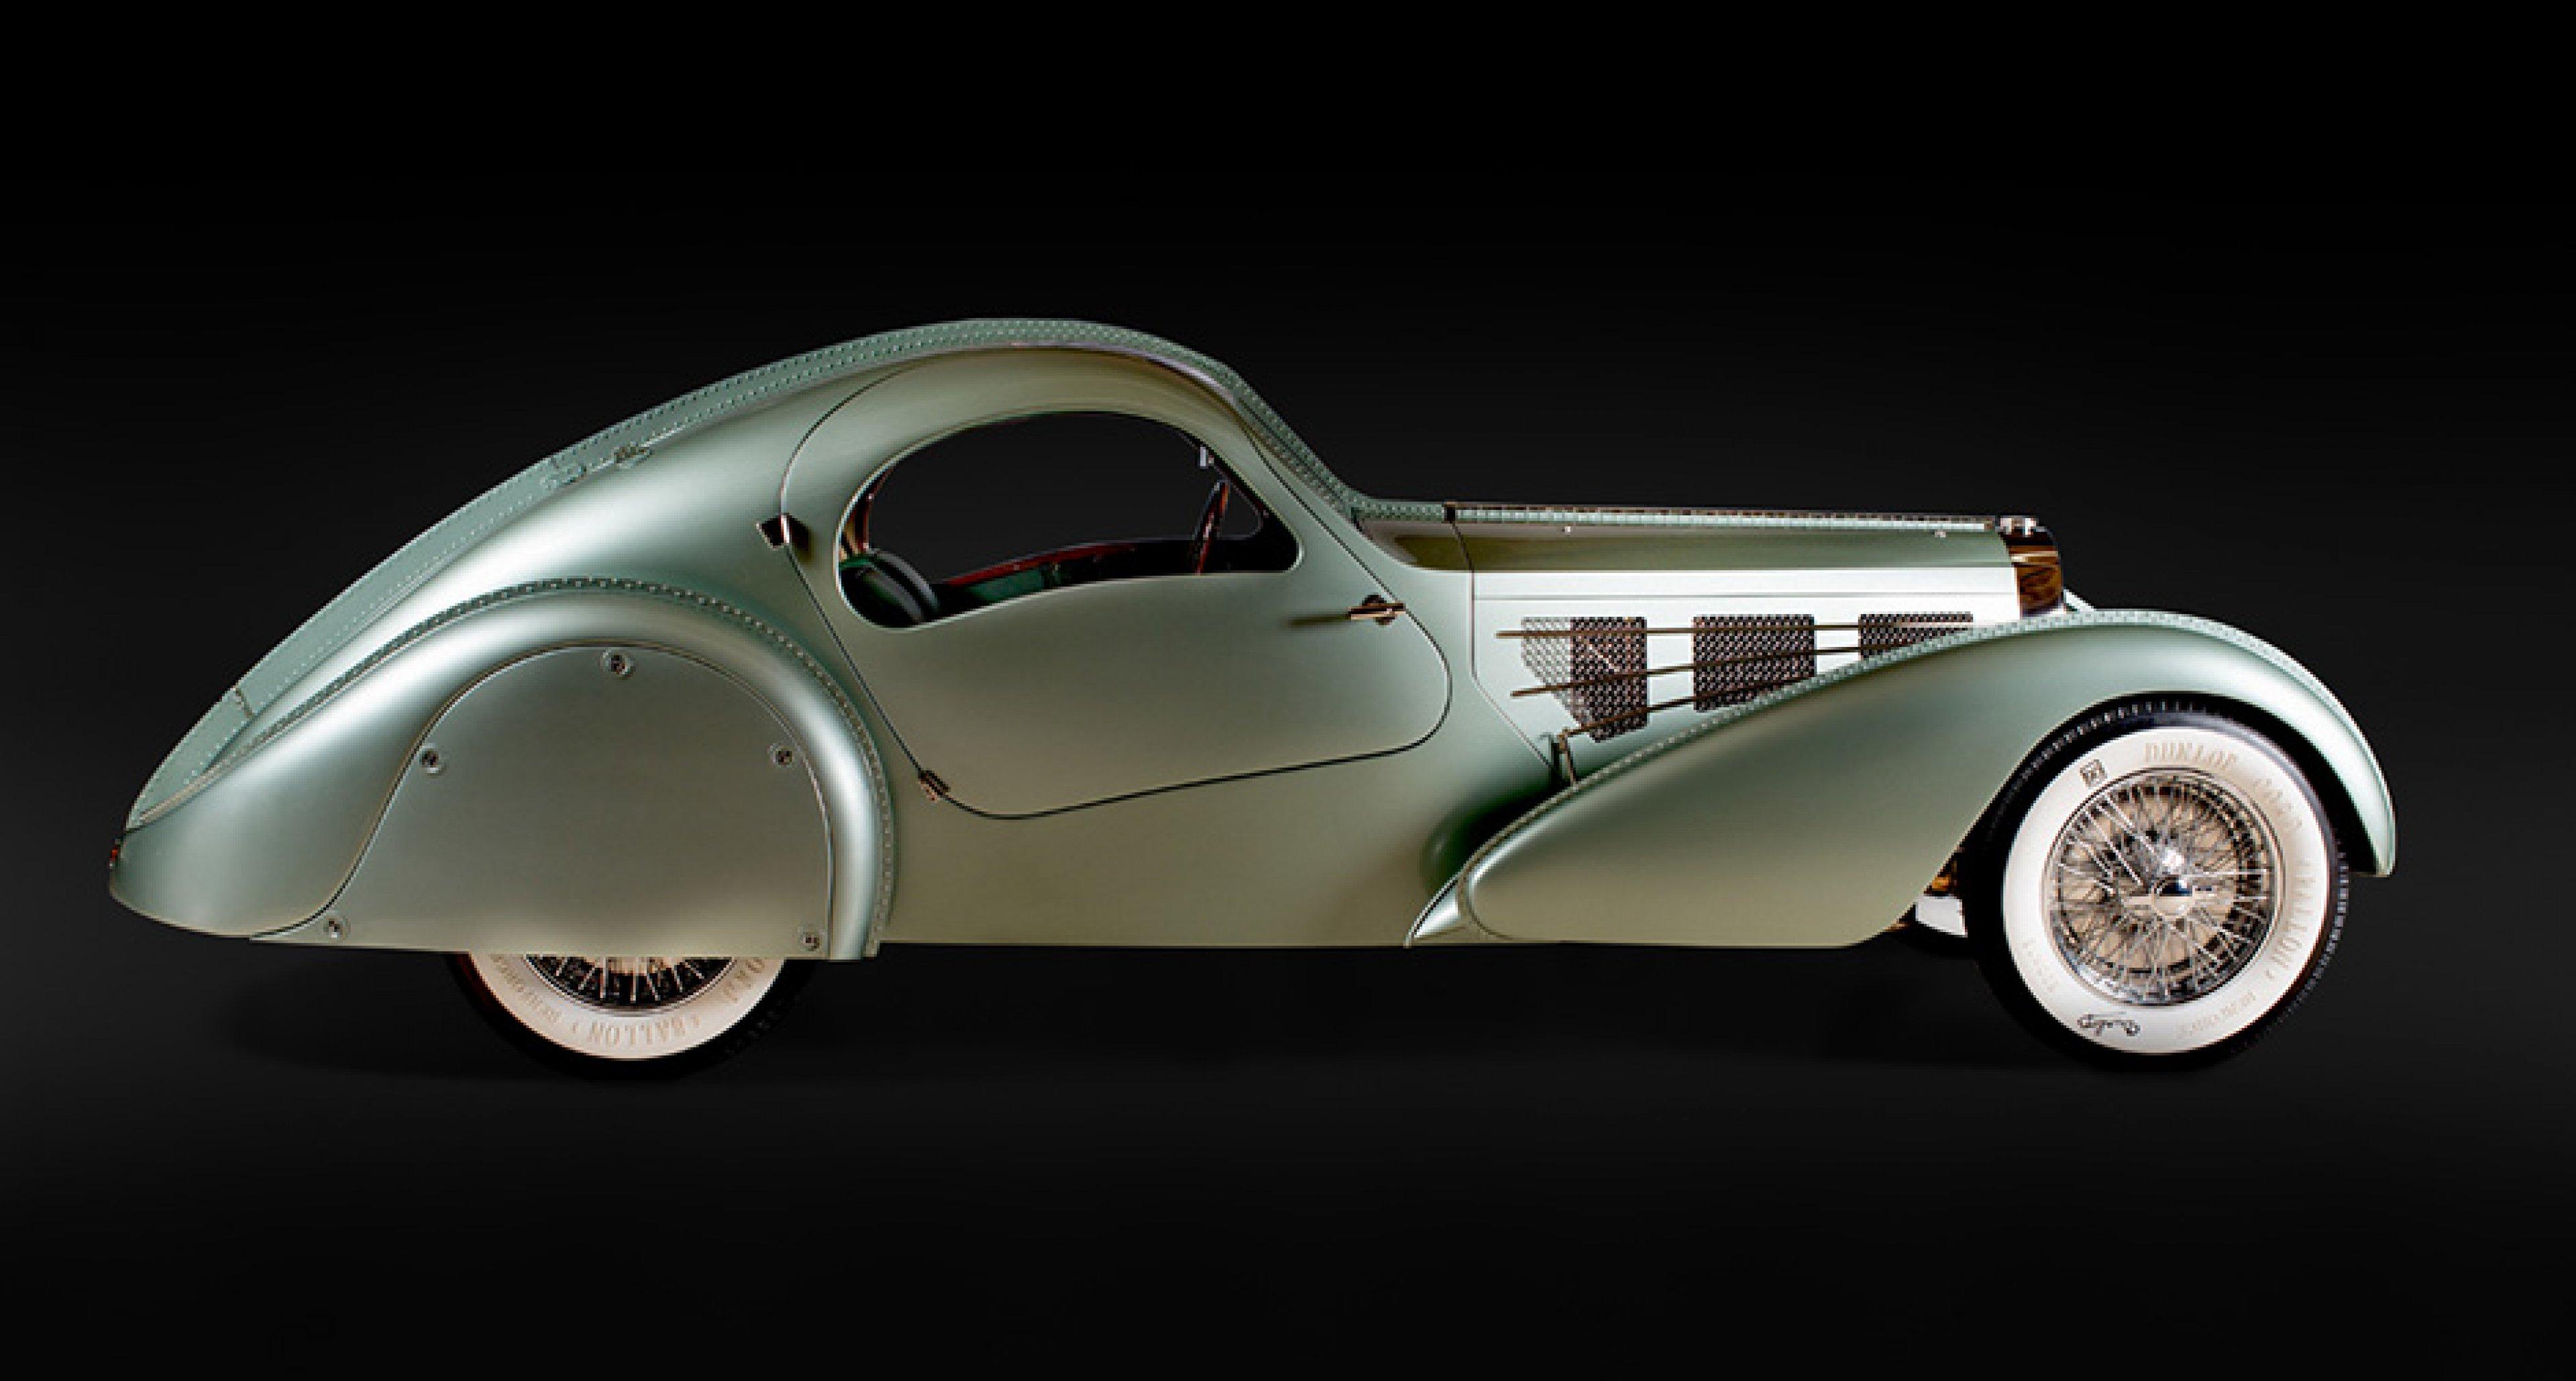 Bugatti Aérolithe, 1935, Courtesy of Chris Ohrstrom; Photo © 2016 Joe Wiecha